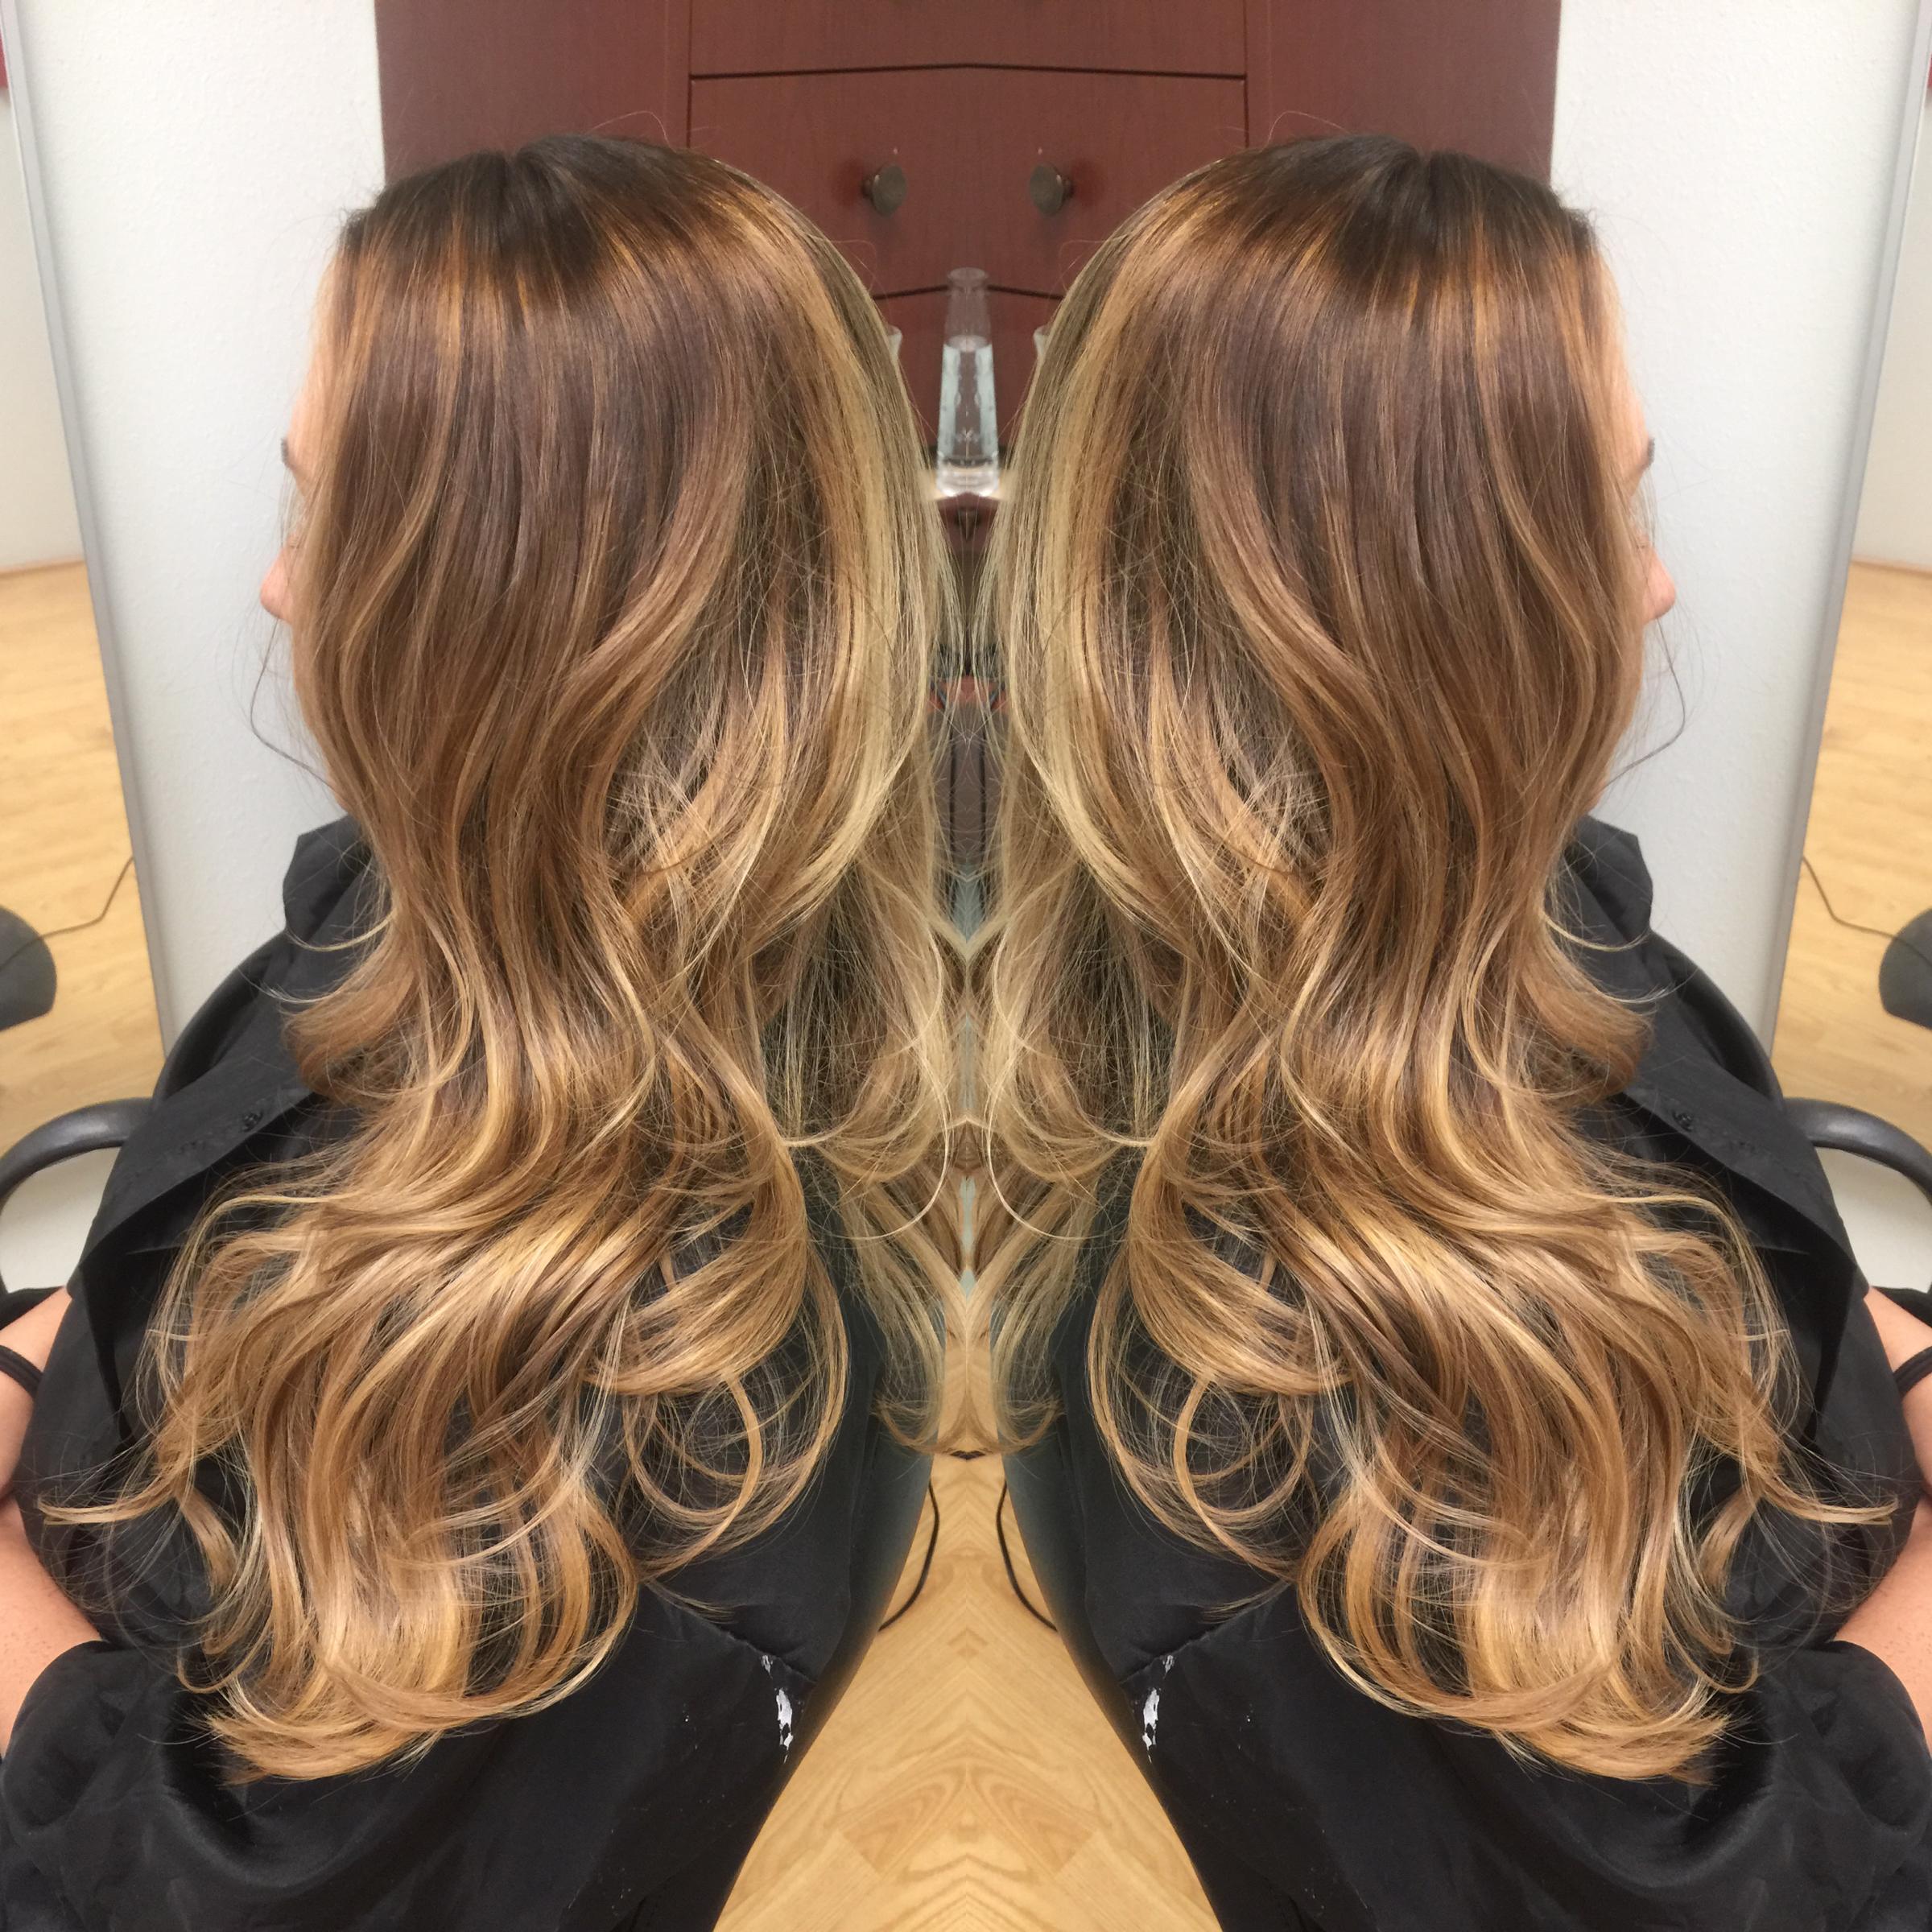 Newport Beach Hair Stylist Dark Warm Blonde Base with Carmel